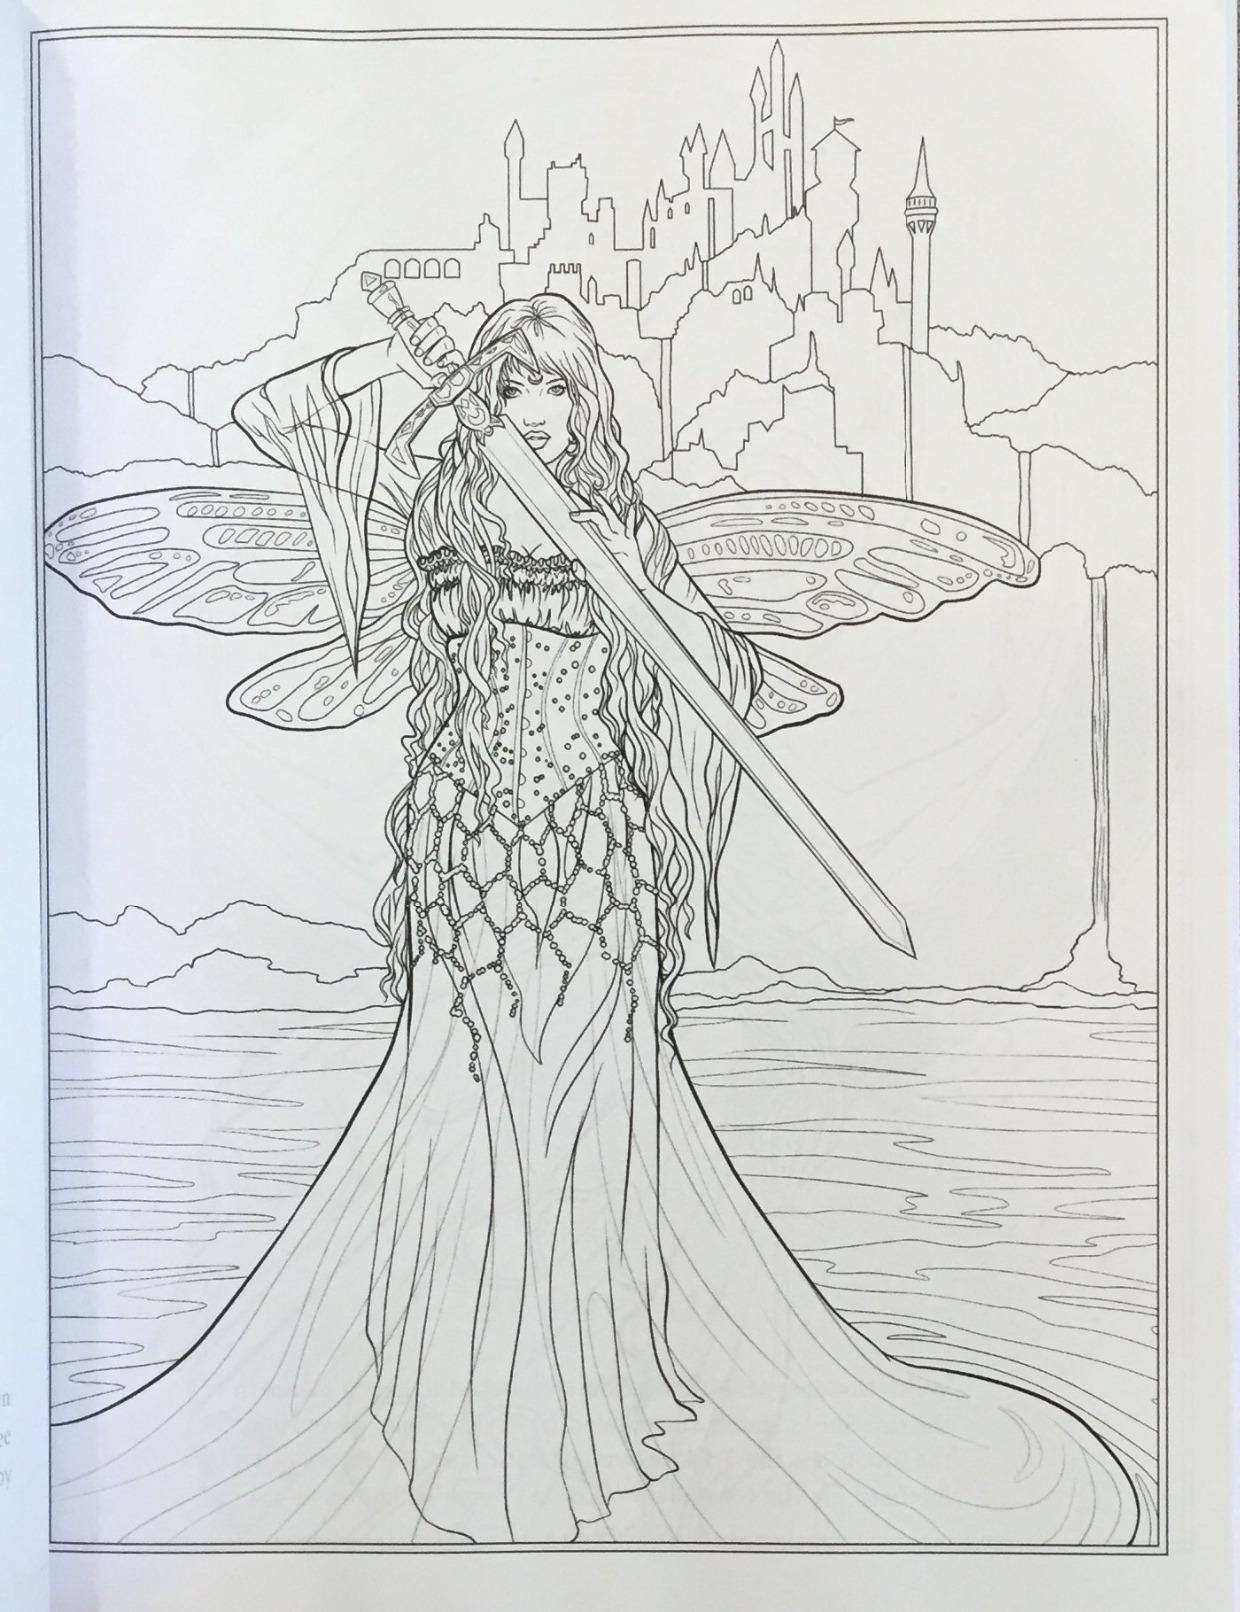 Amazon Com Goddess And Mythology Coloring Book Fantasy Coloring By Selina Volume 9 9780994585 Fairy Coloring Pages Coloring Pages Detailed Coloring Pages [ 1612 x 1240 Pixel ]